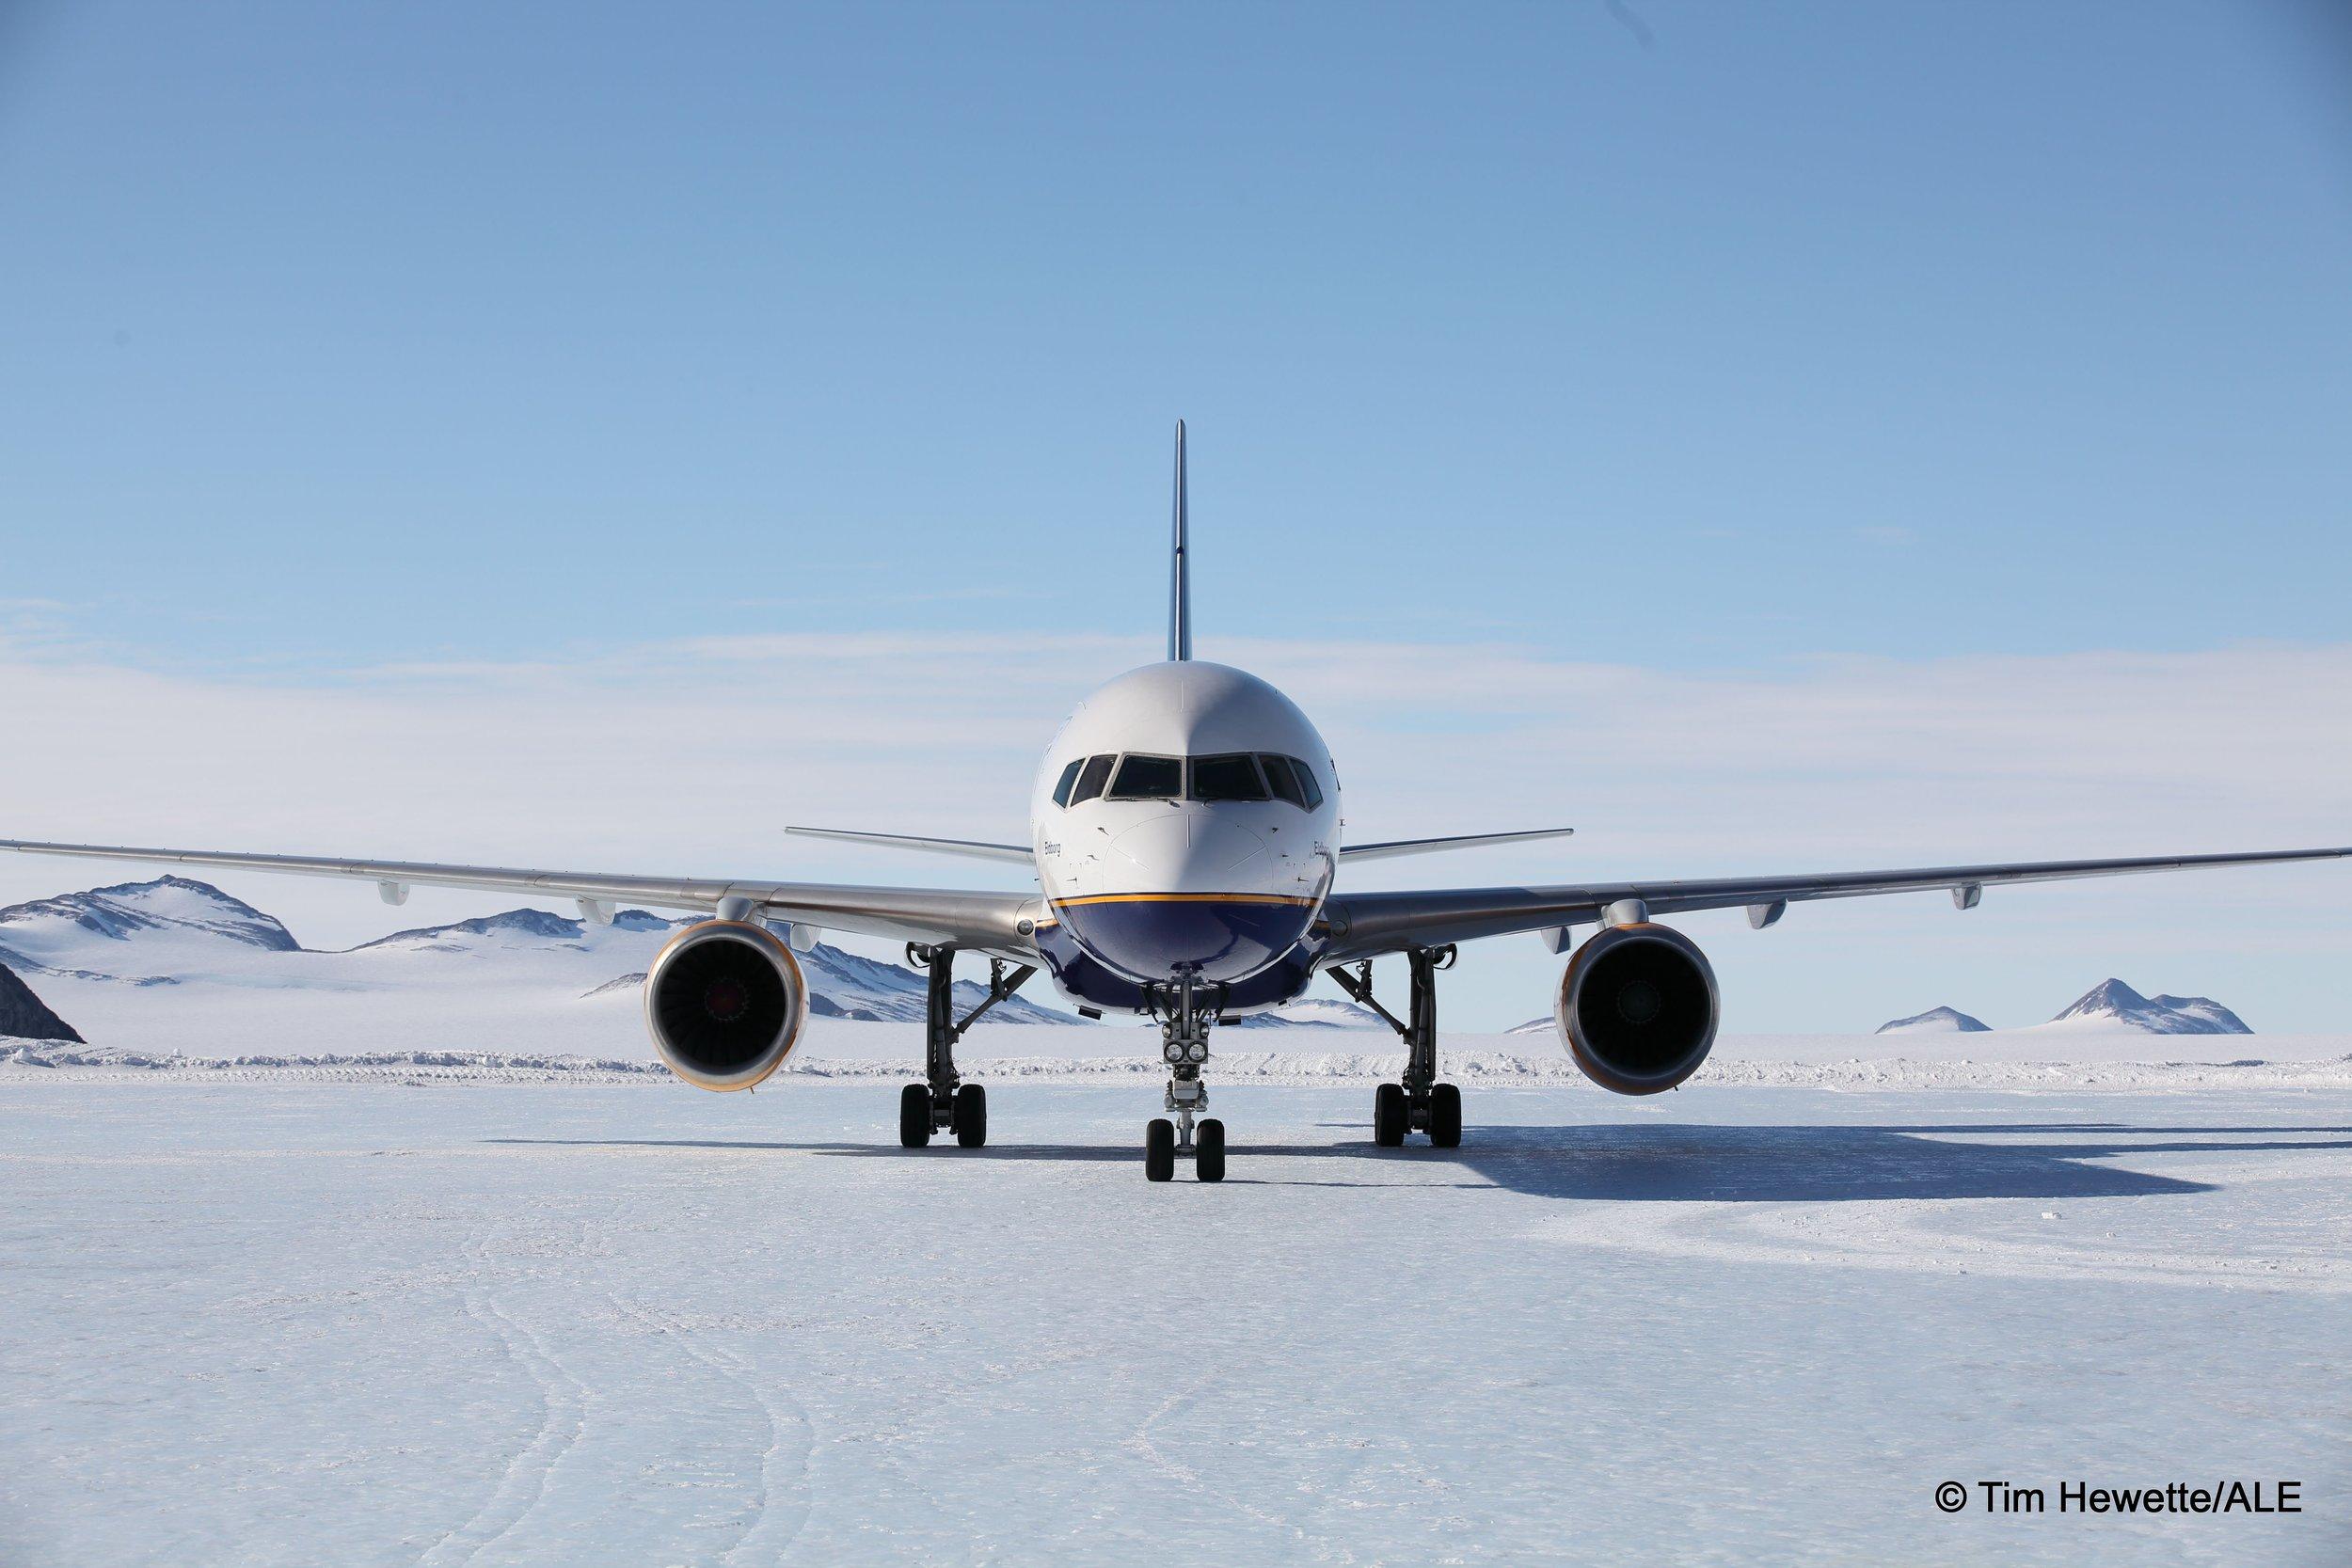 boeing 757 union glacier blue ice